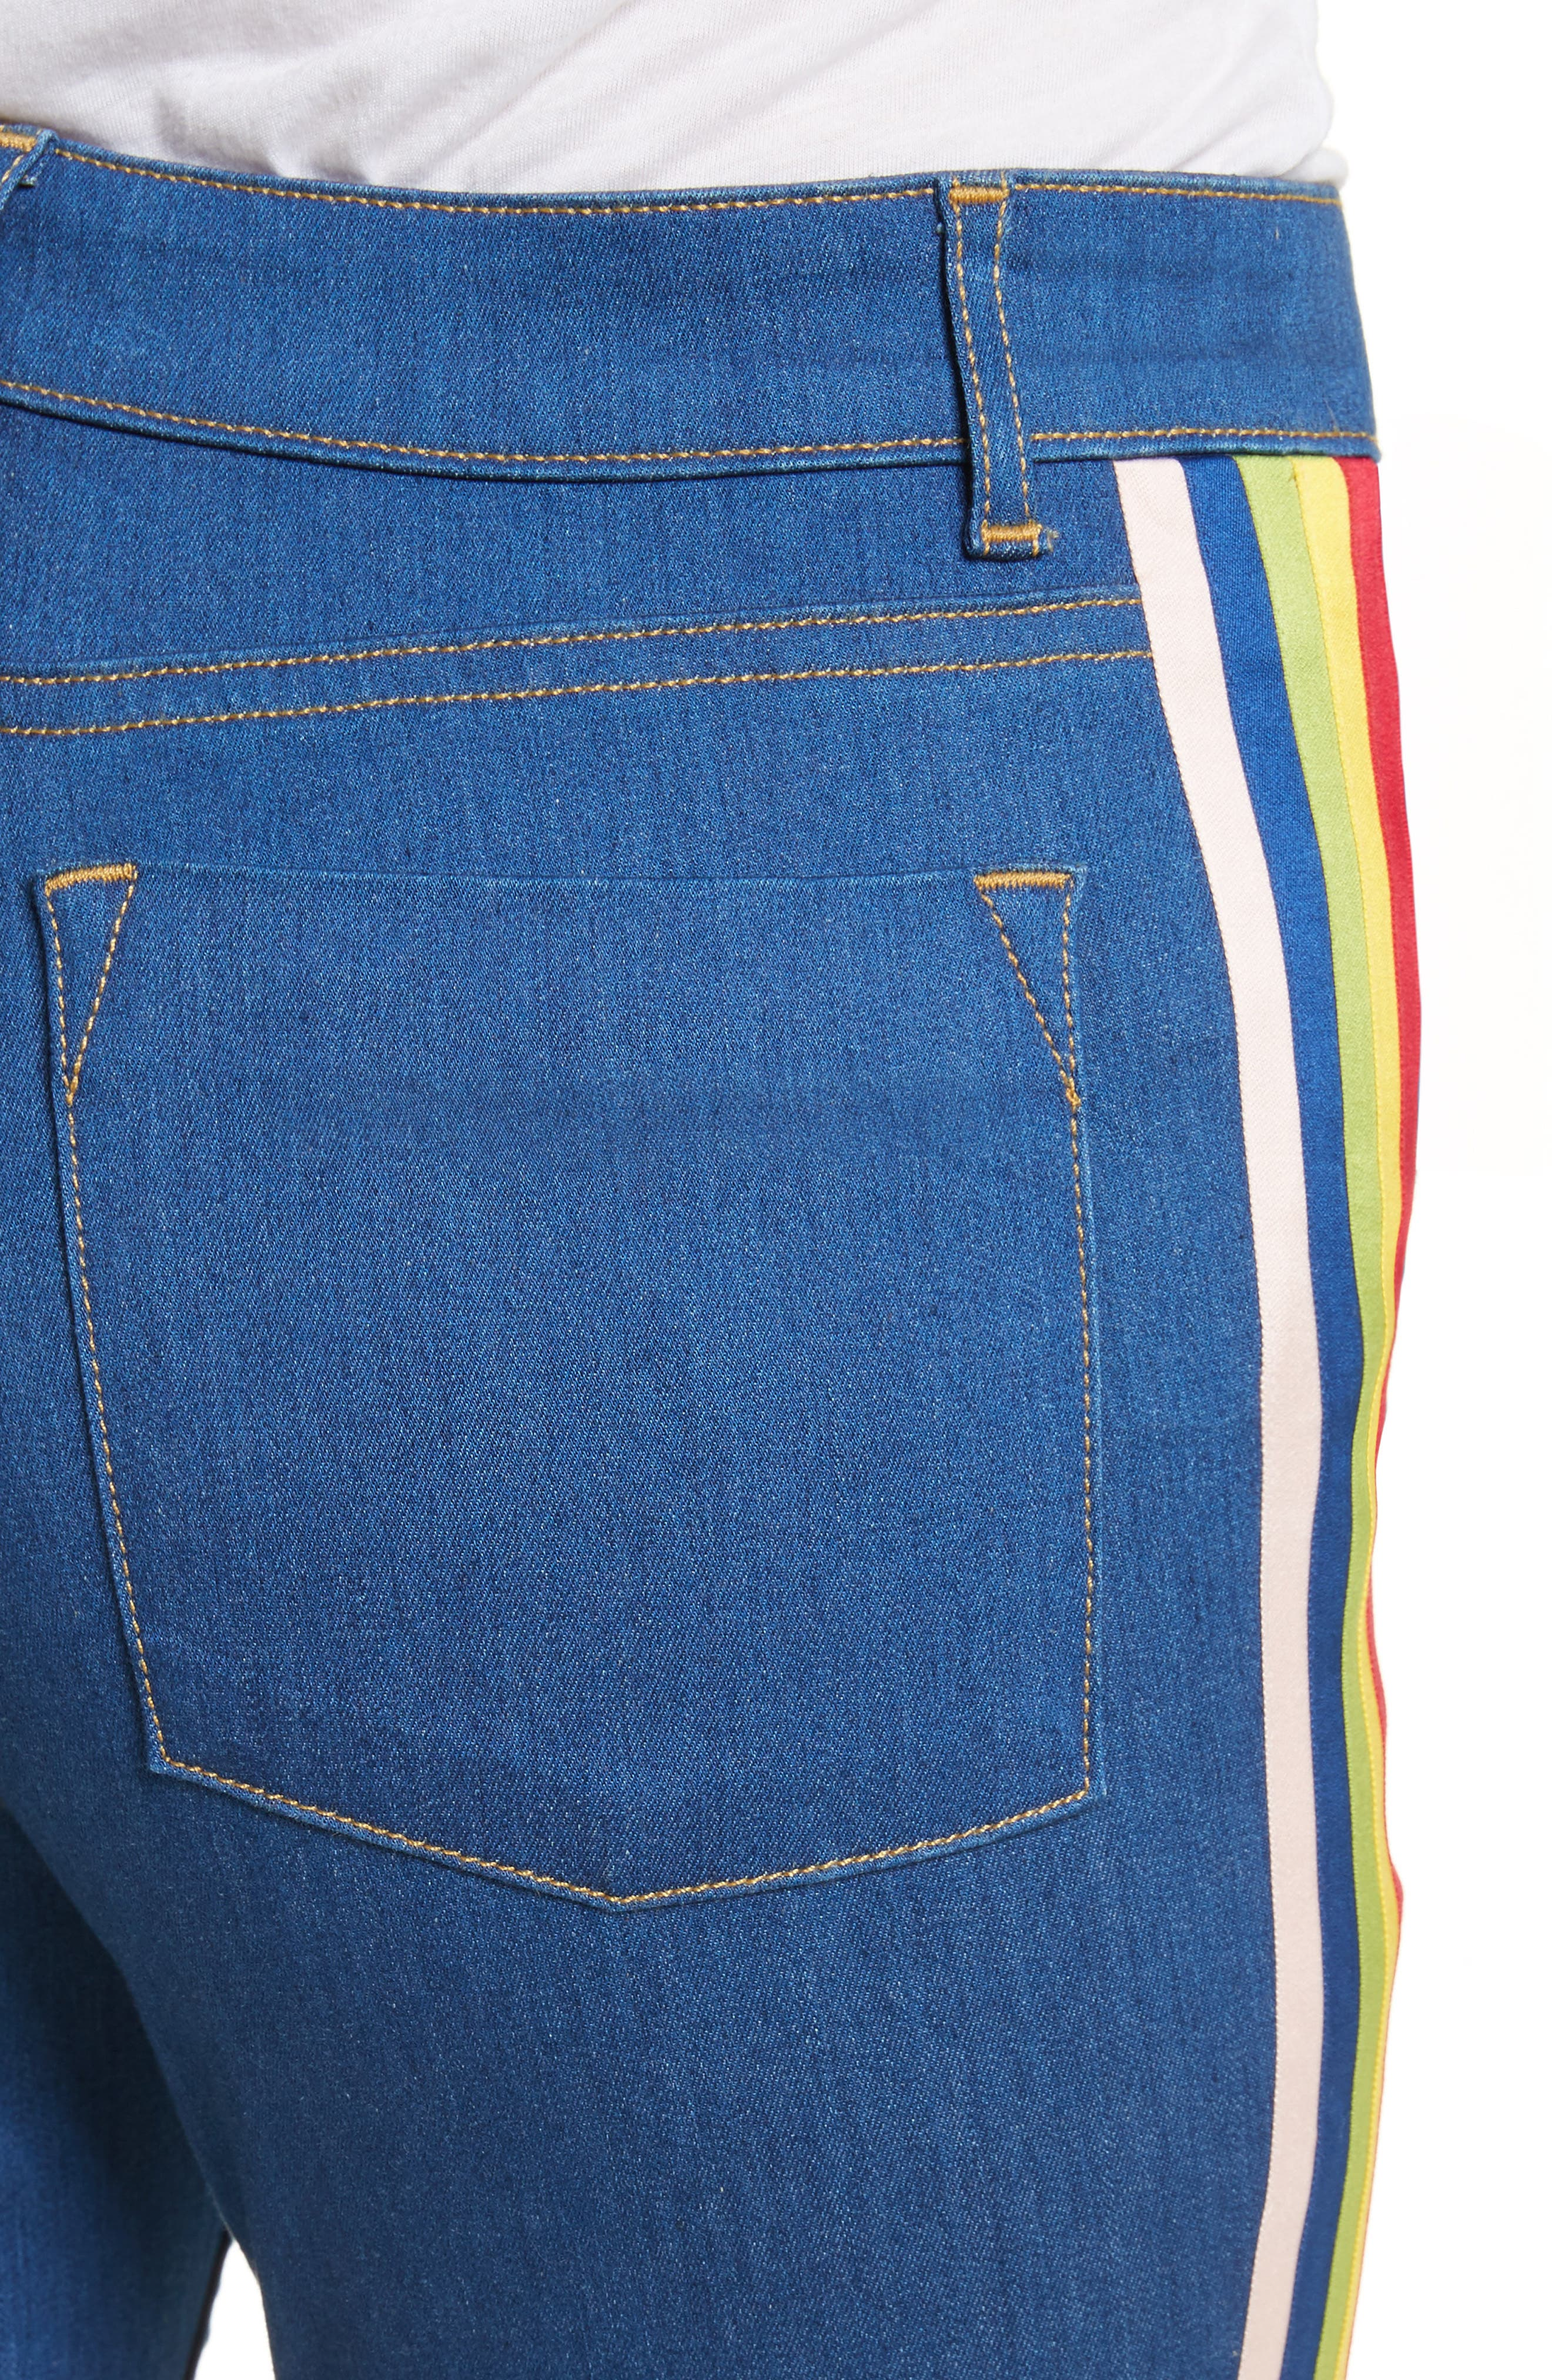 Alternate Image 4  - Alice + Olivia Kayleigh Bell Jeans